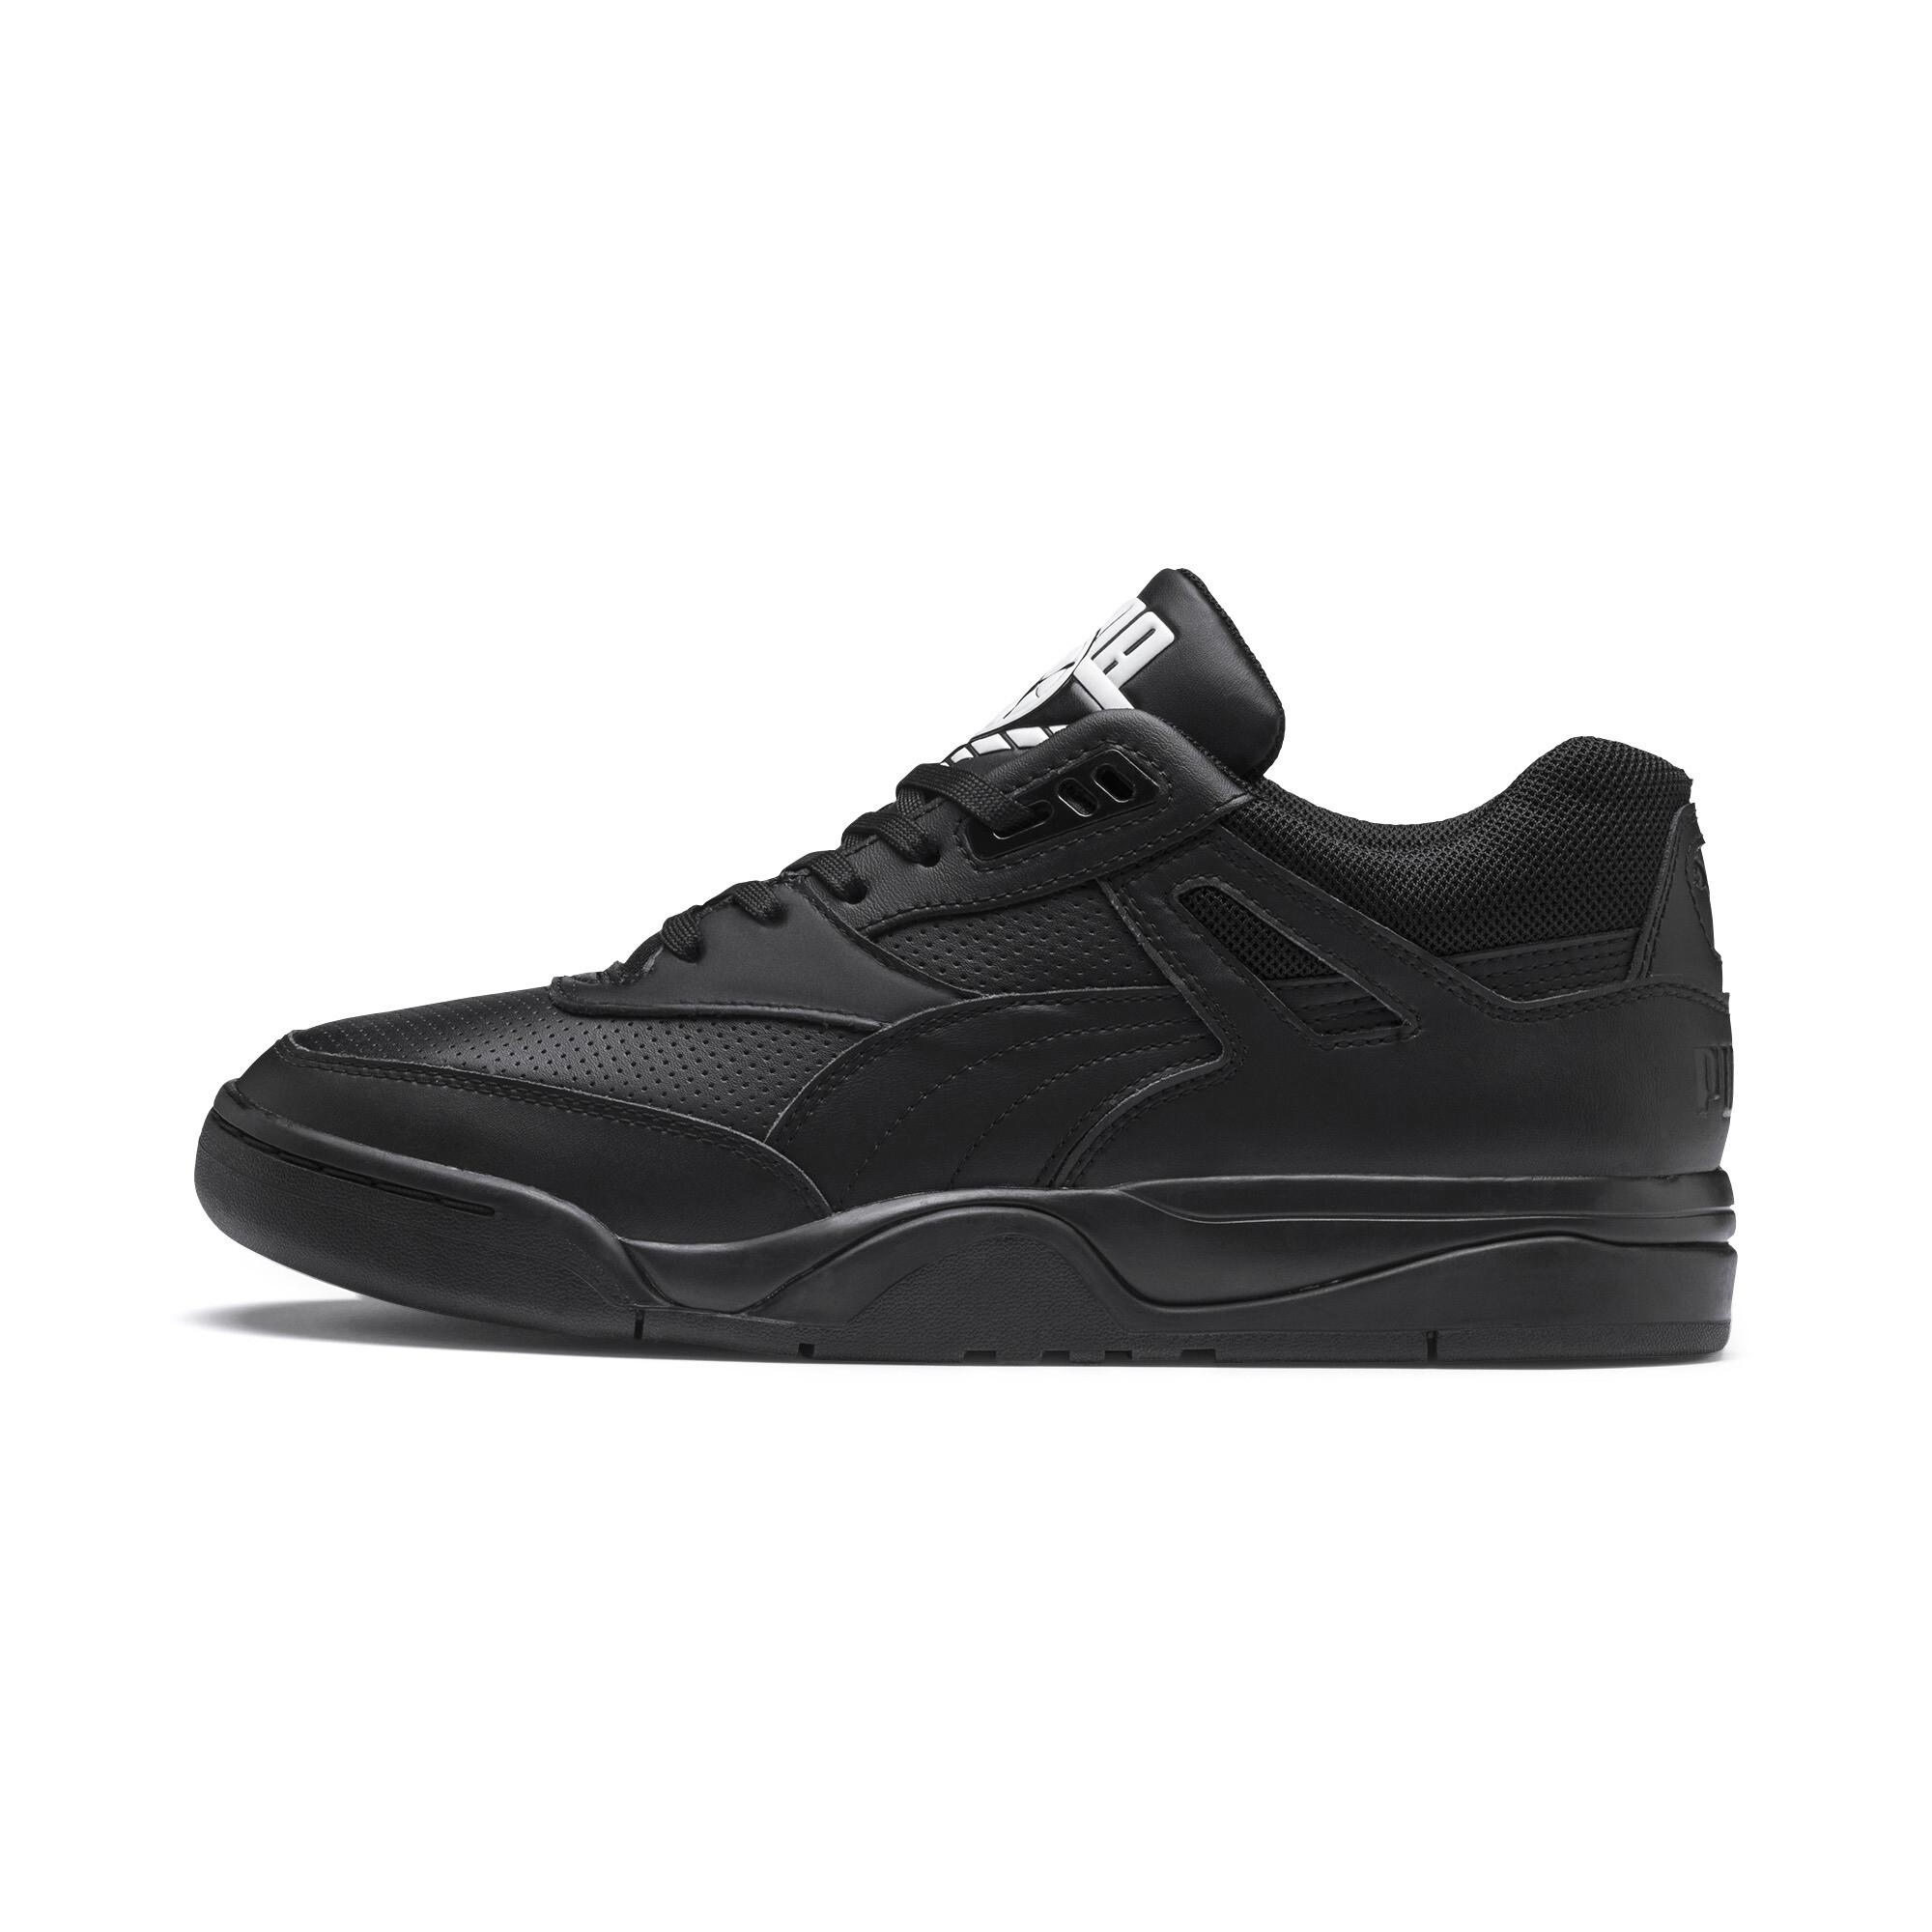 Indexbild 22 - PUMA Palace Guard Sneaker Unisex Schuhe Sport Classics Neu